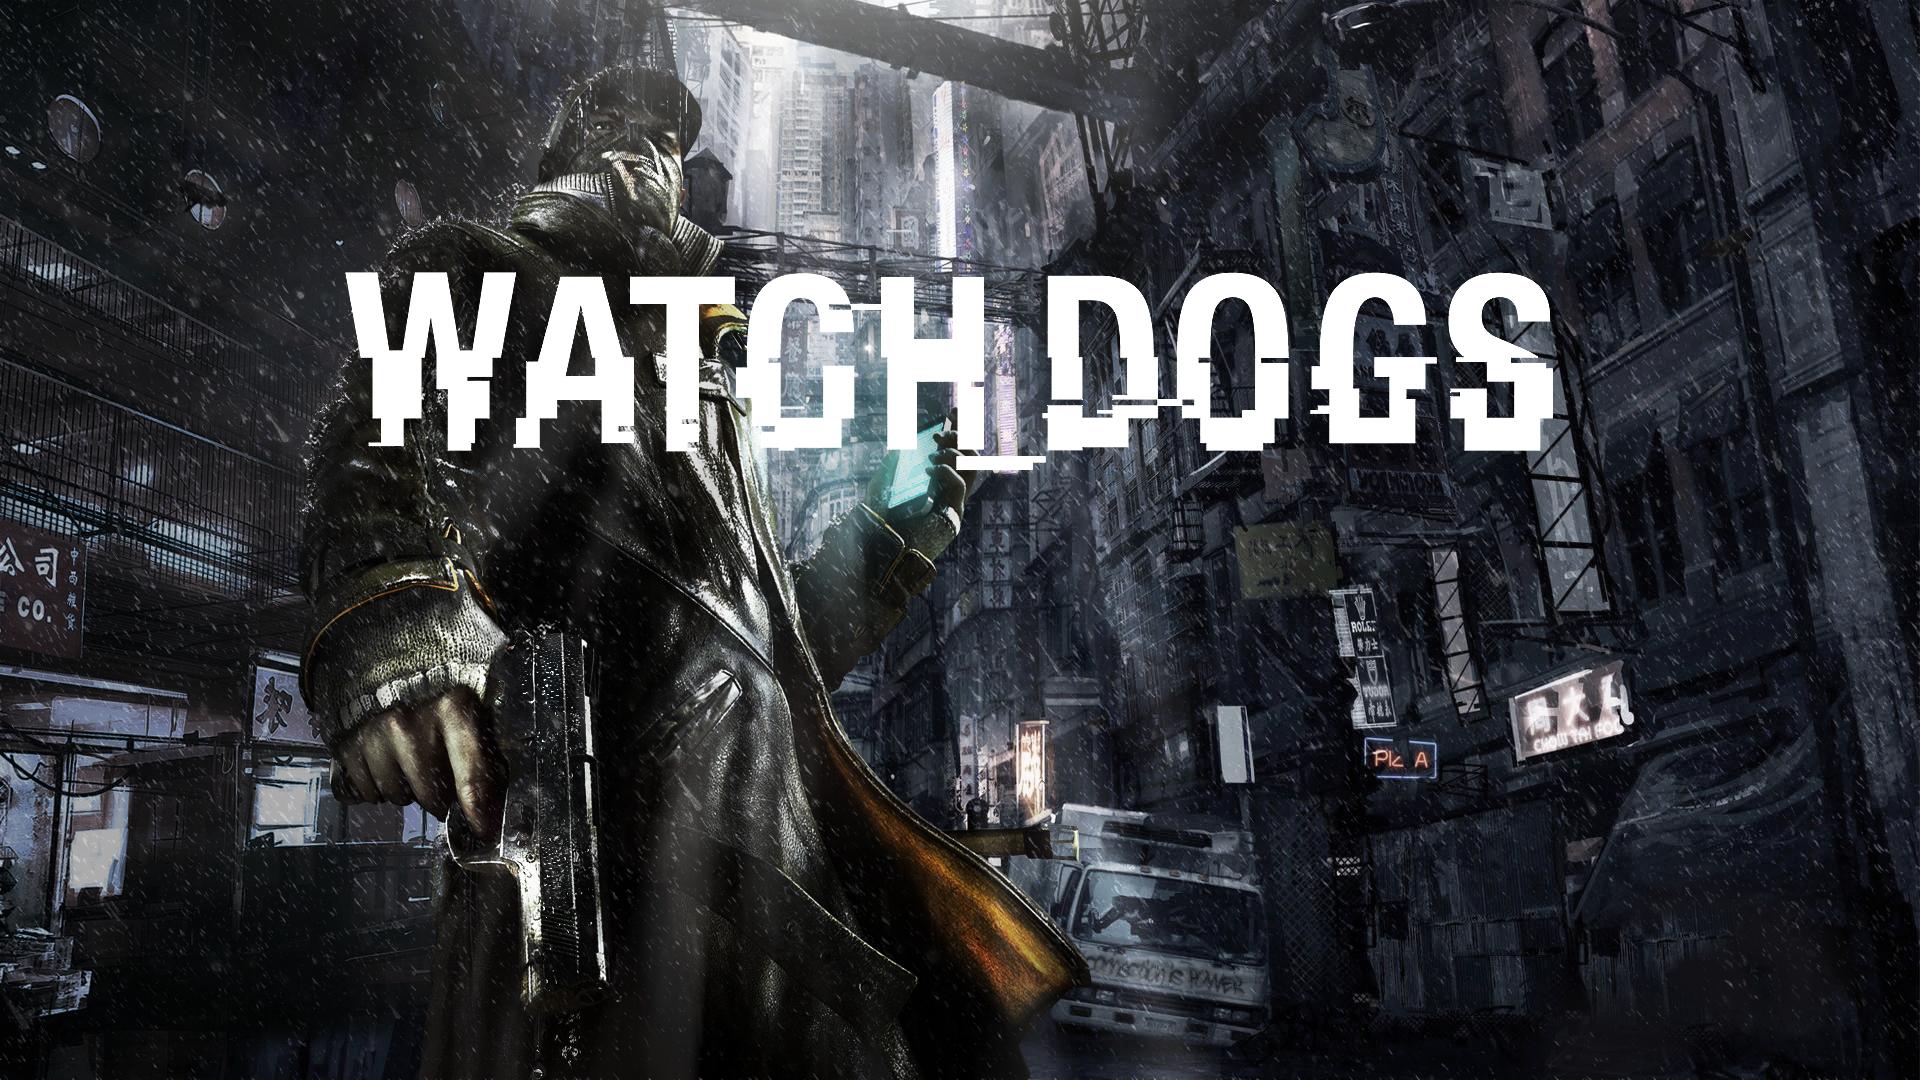 Watch Dogs Wallpaper Loud Title version by SpectreSinistre on 1920x1080